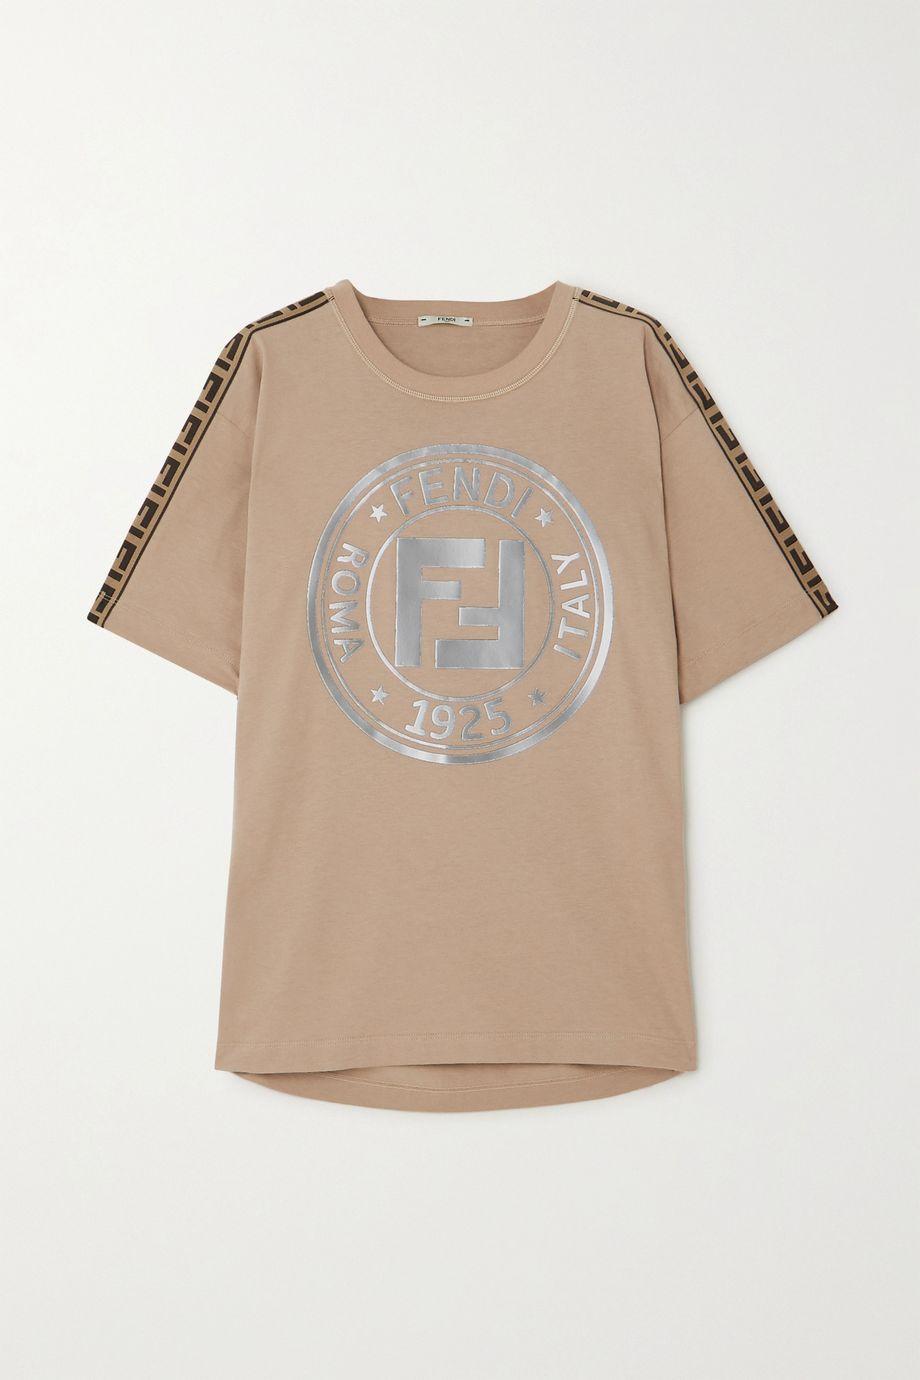 Fendi Fendirama jacquard-trimmed printed cotton-jersey T-shirt